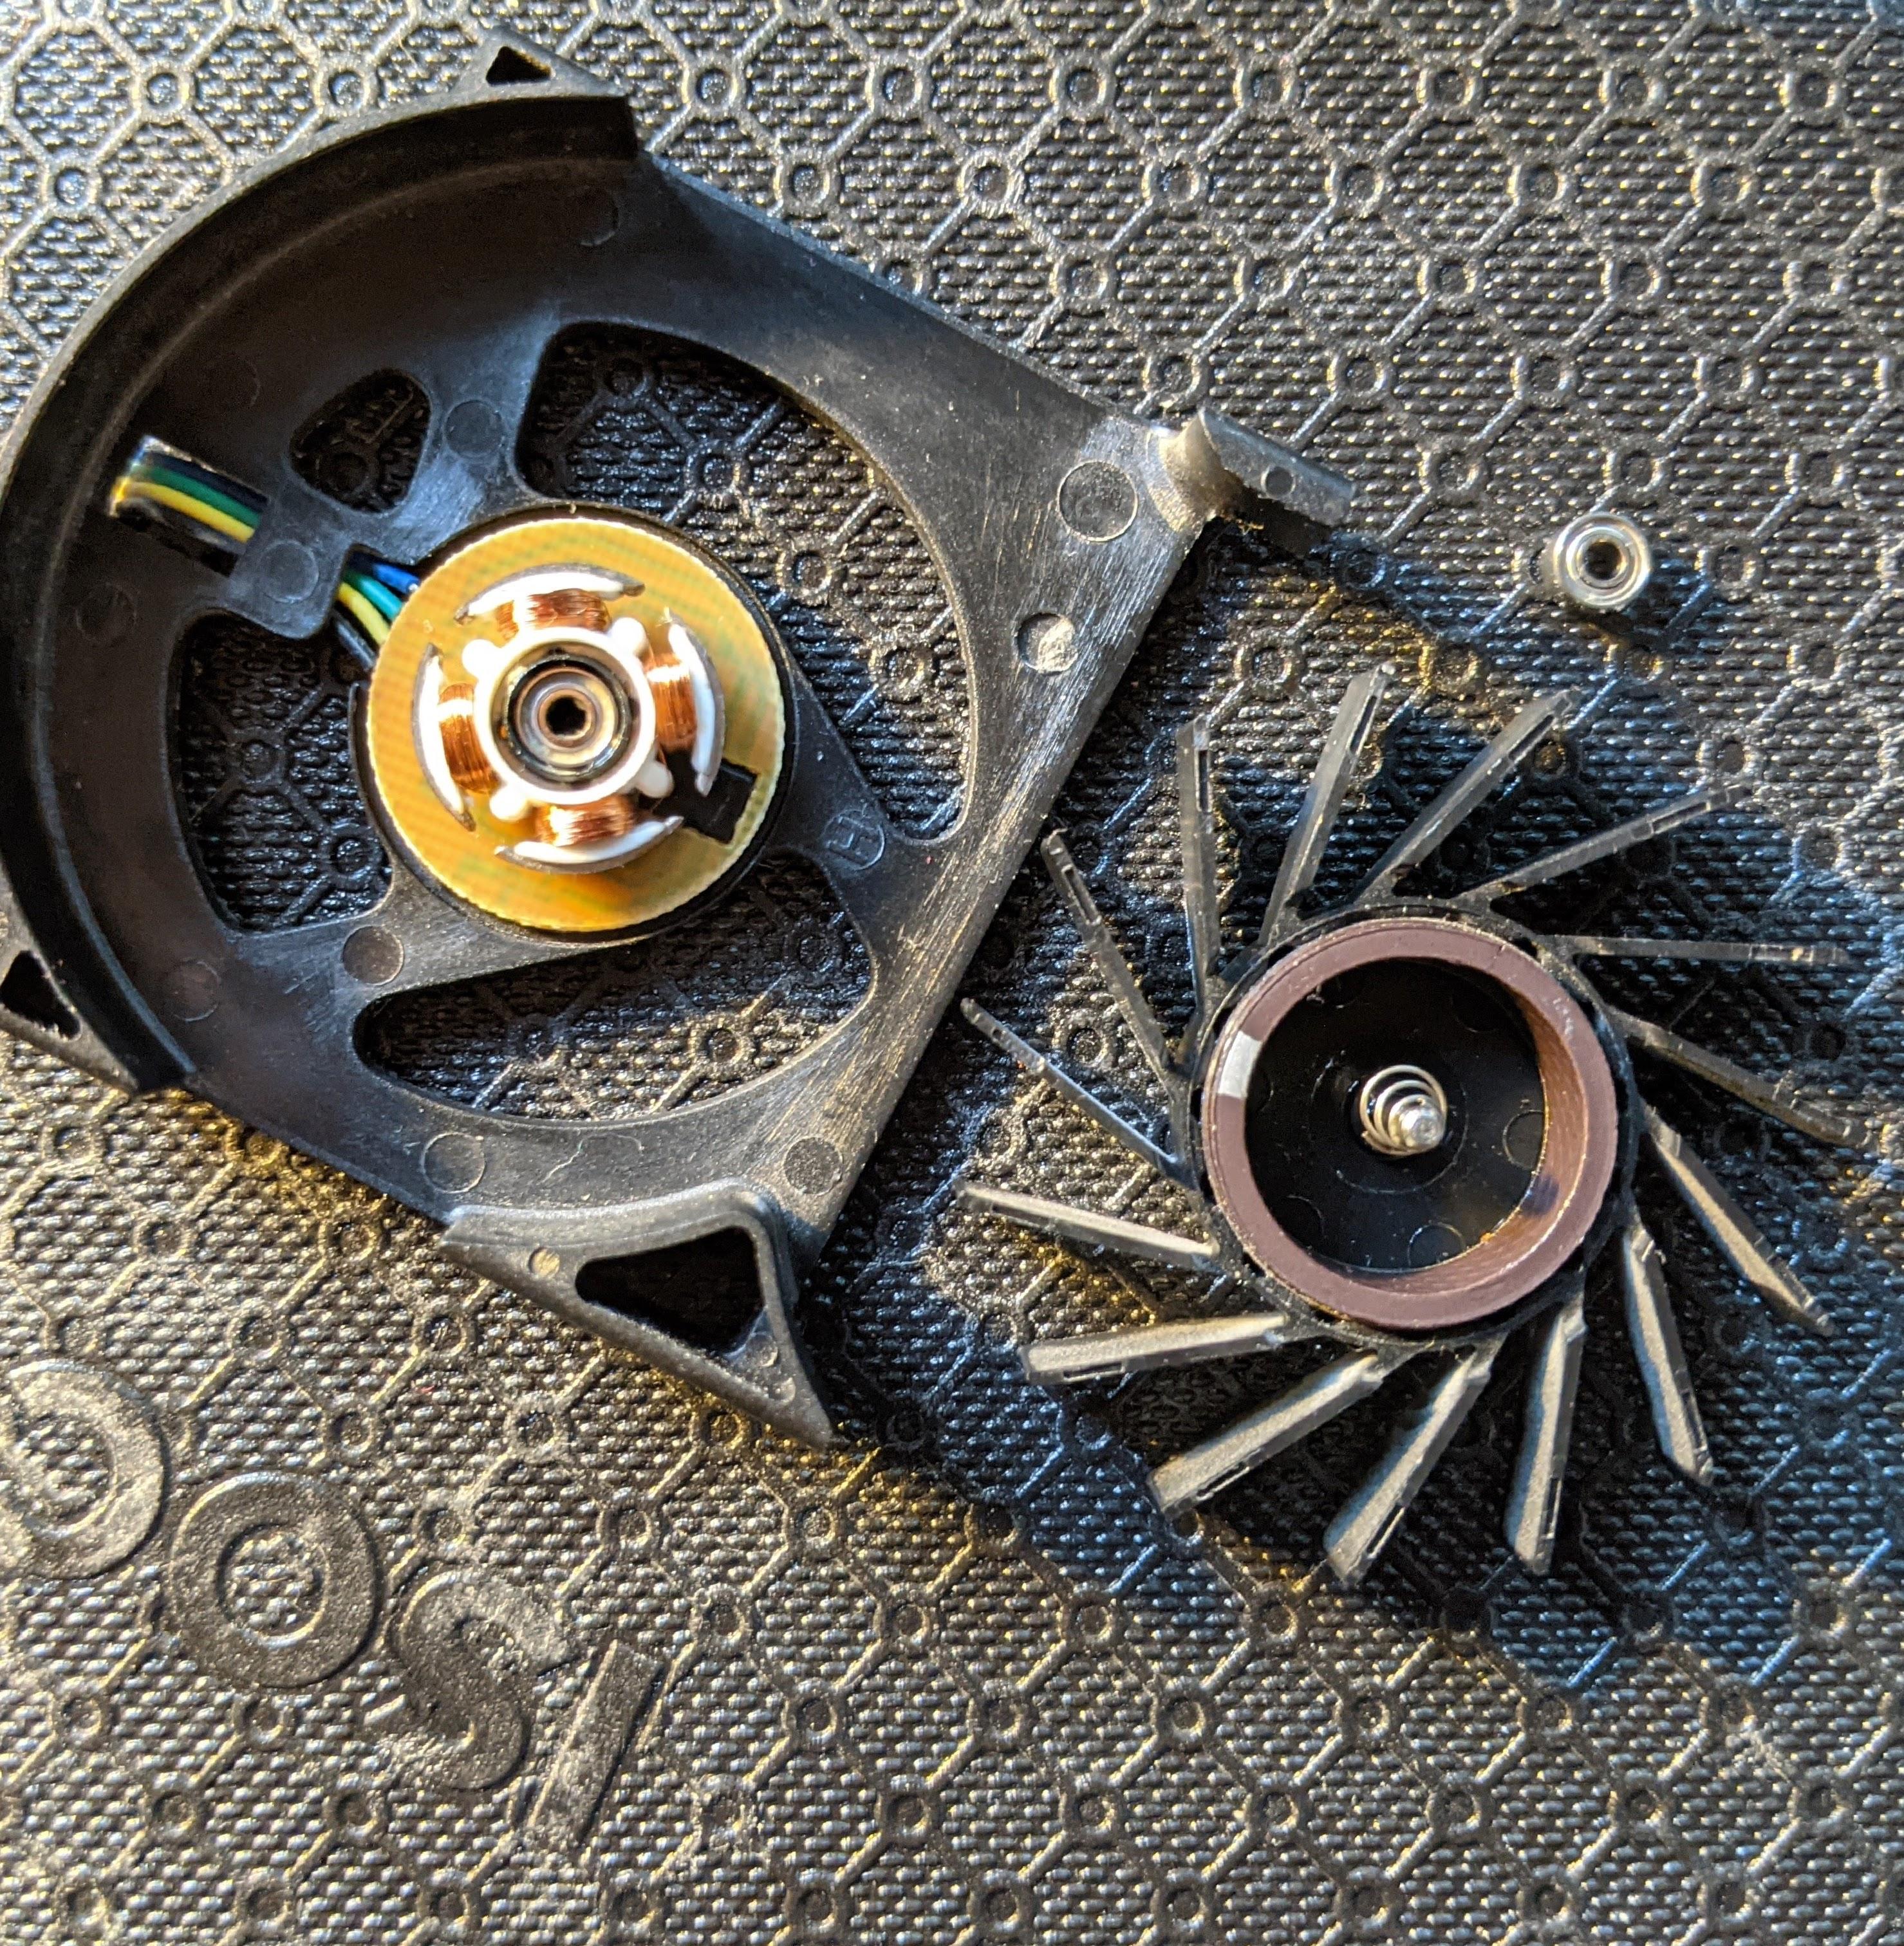 FirstD fan disassembled